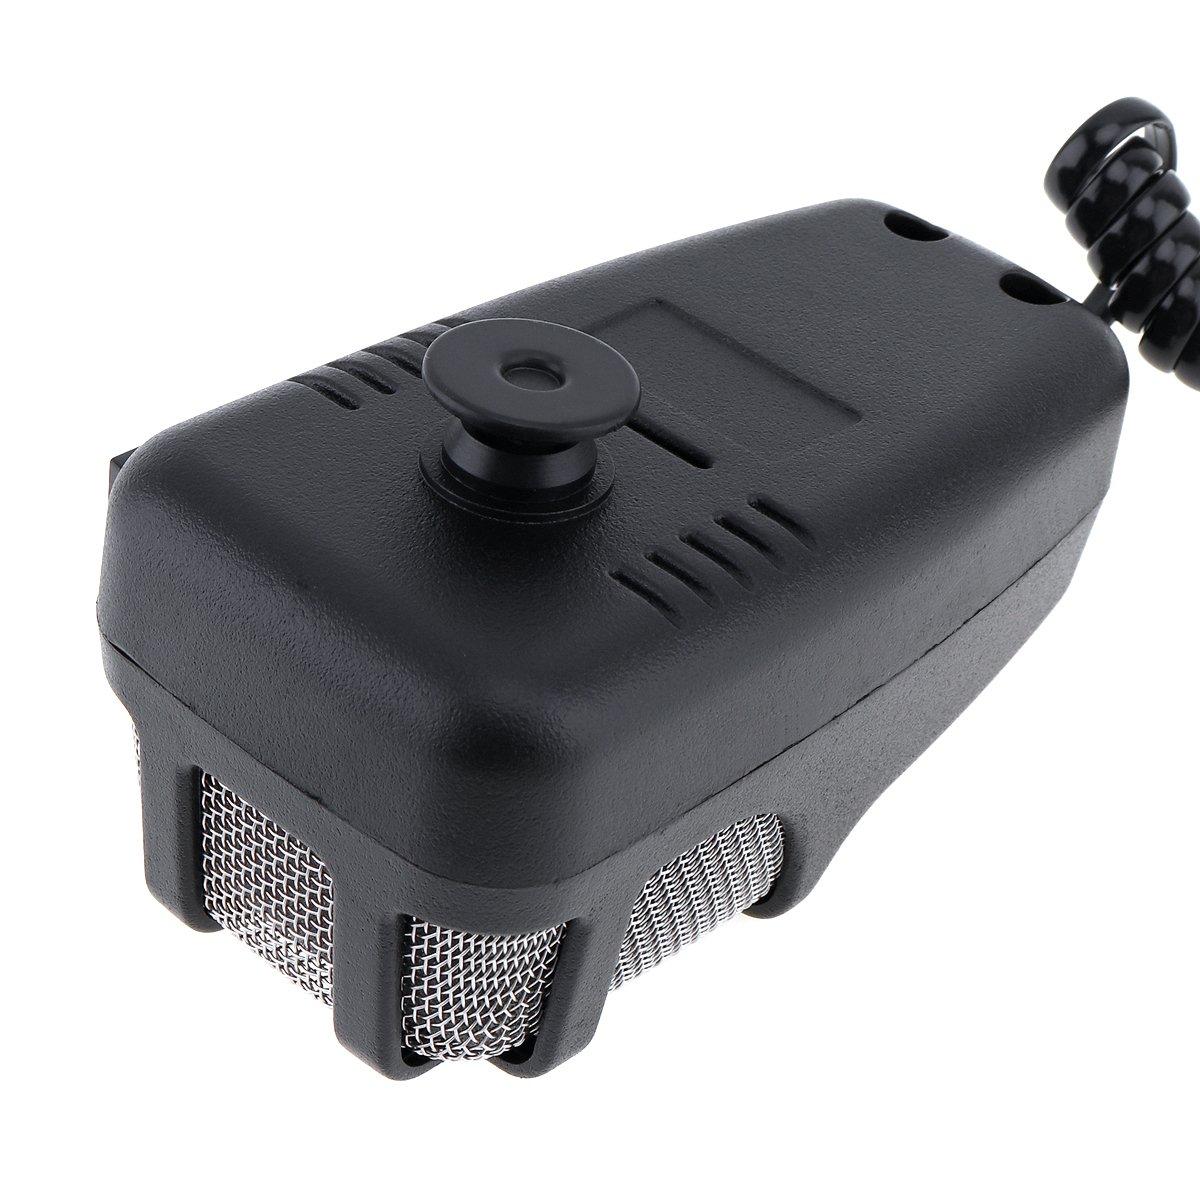 Siren Altavoz electr/ónico de alarma de motocicleta con sonido MIC 100 W 12 V 7